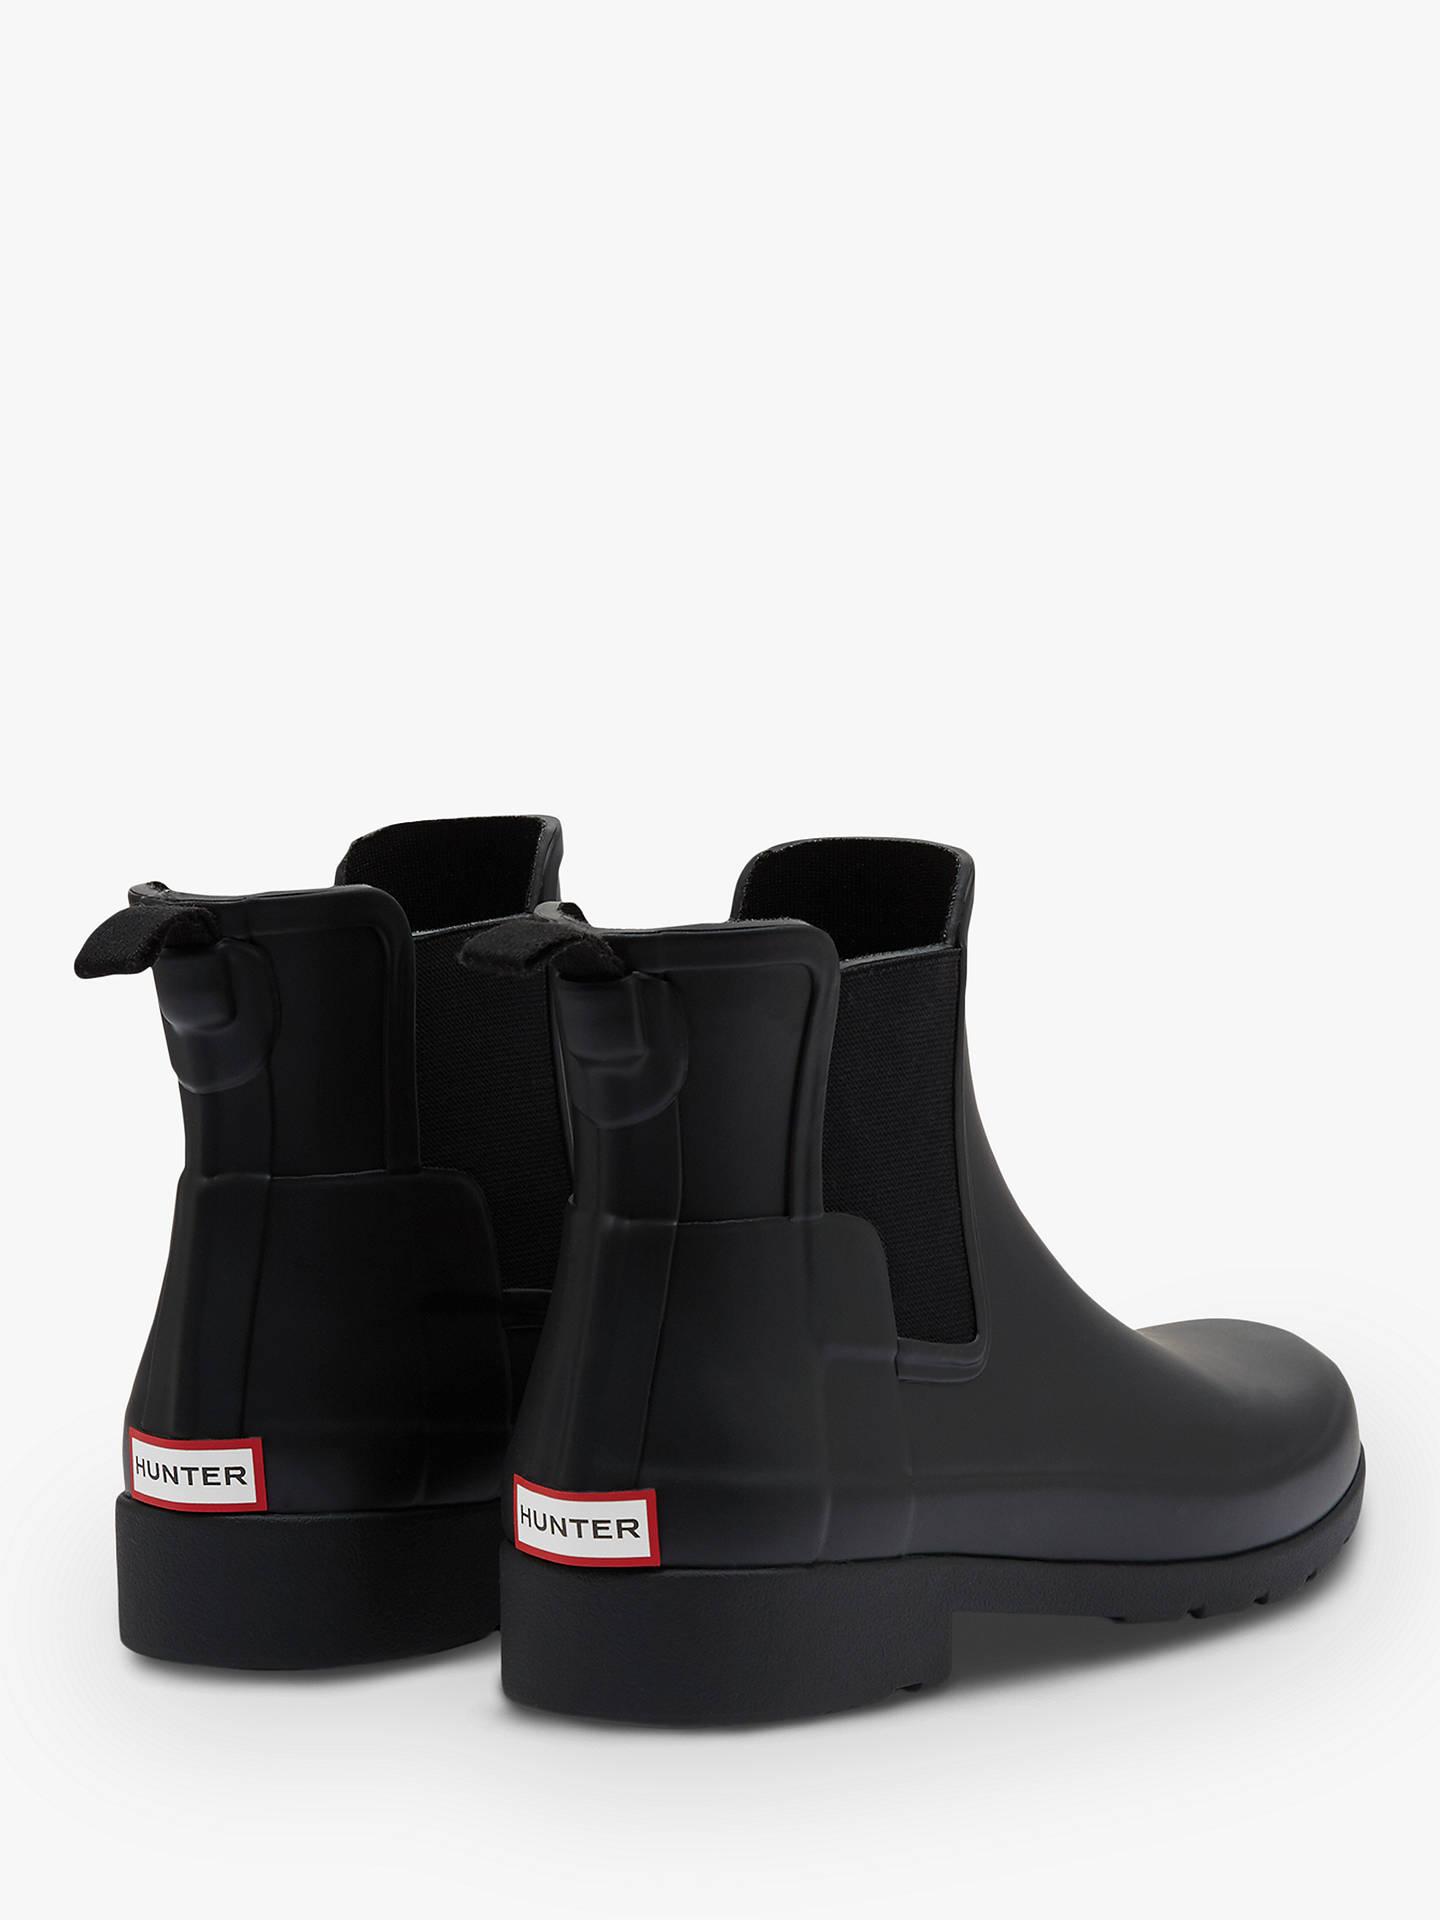 Hunter Women's Original Waterproof Refined Chelsea Wellington Boots, Black